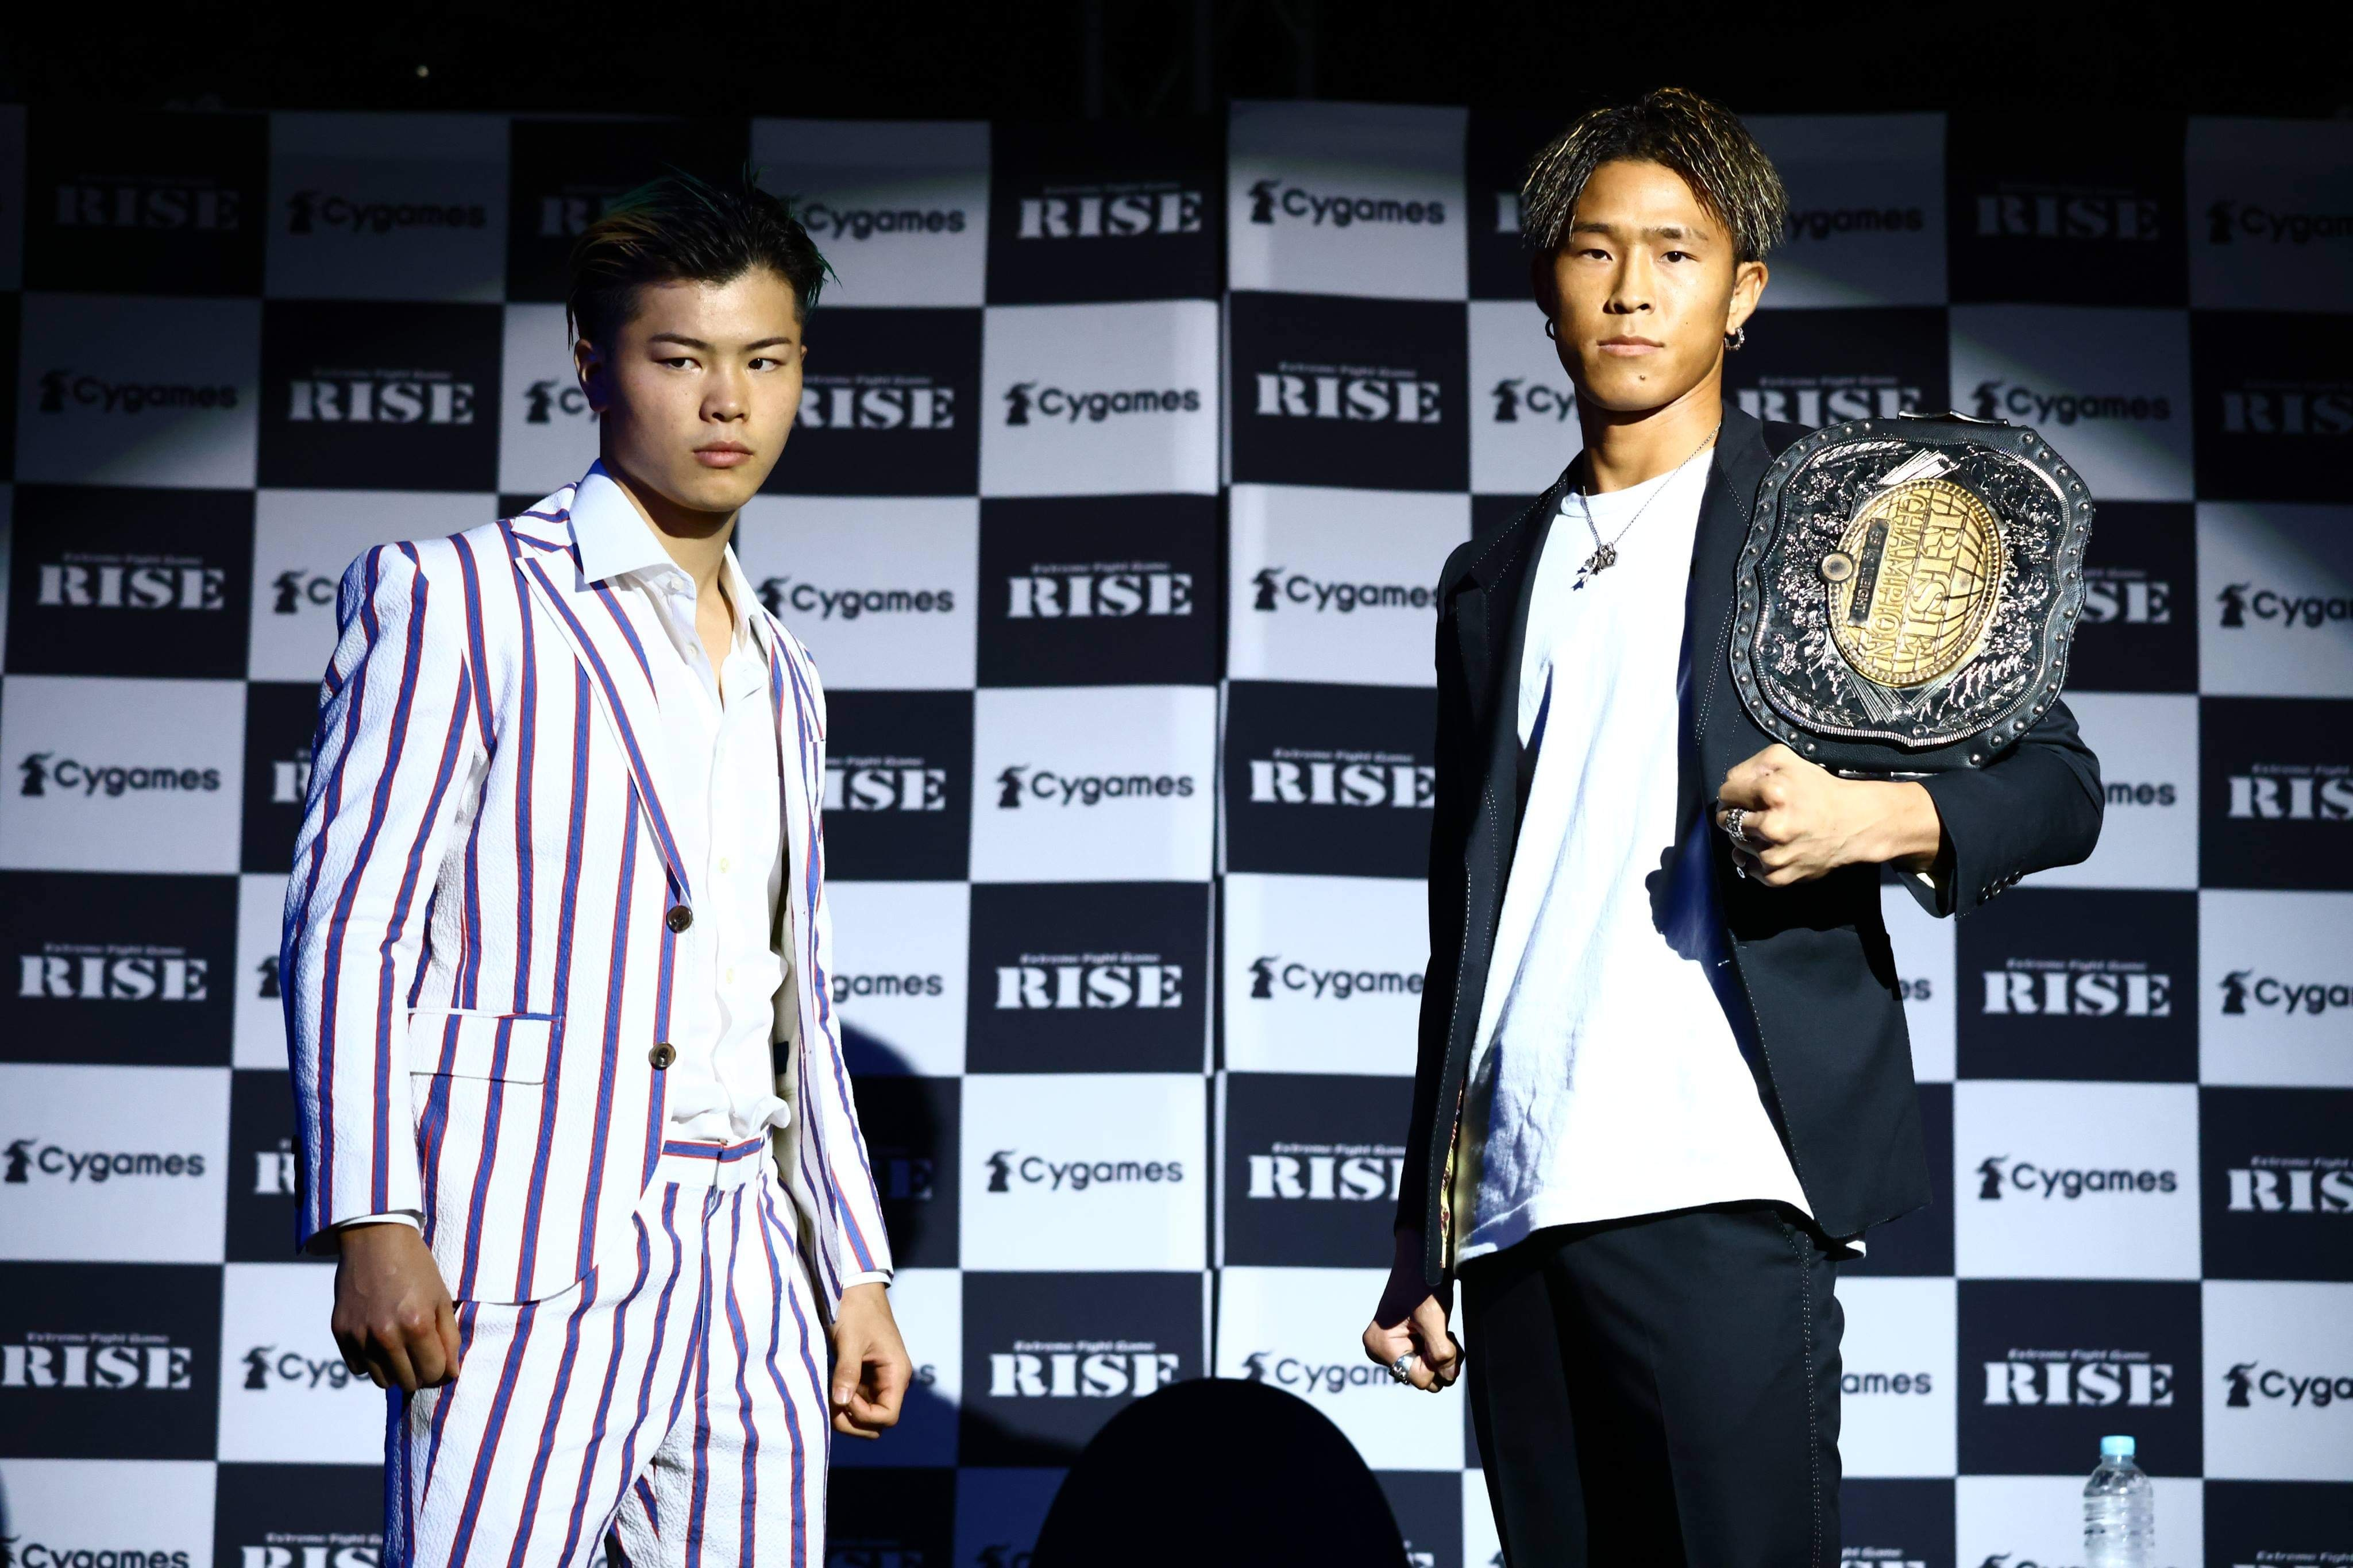 『Cygames presents RISE WORLD SERIES 2021 YOKOHAMA』の参戦選手